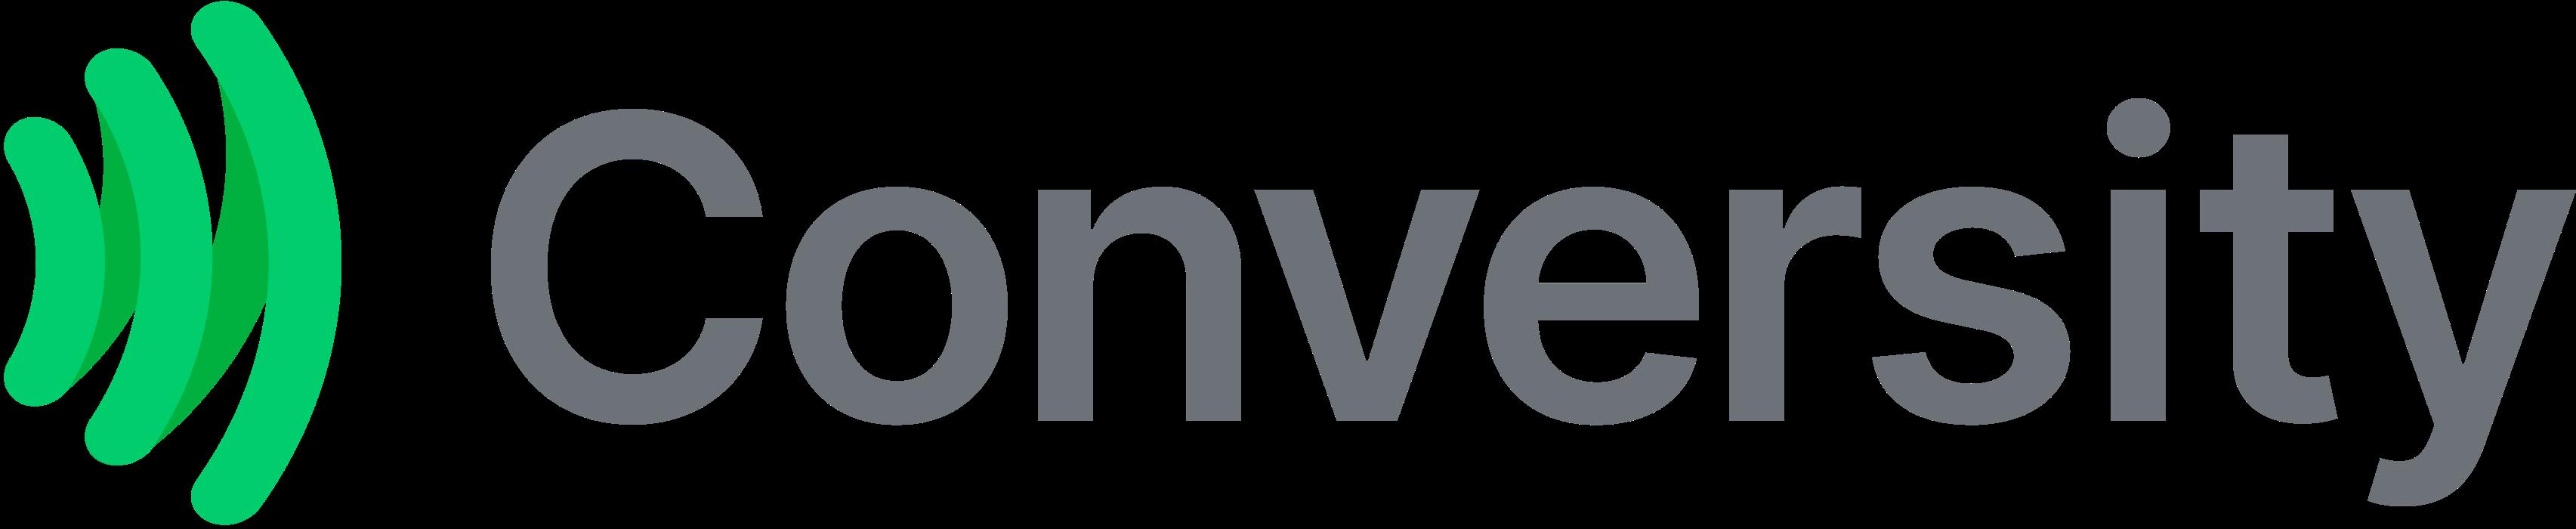 Conversity Logo